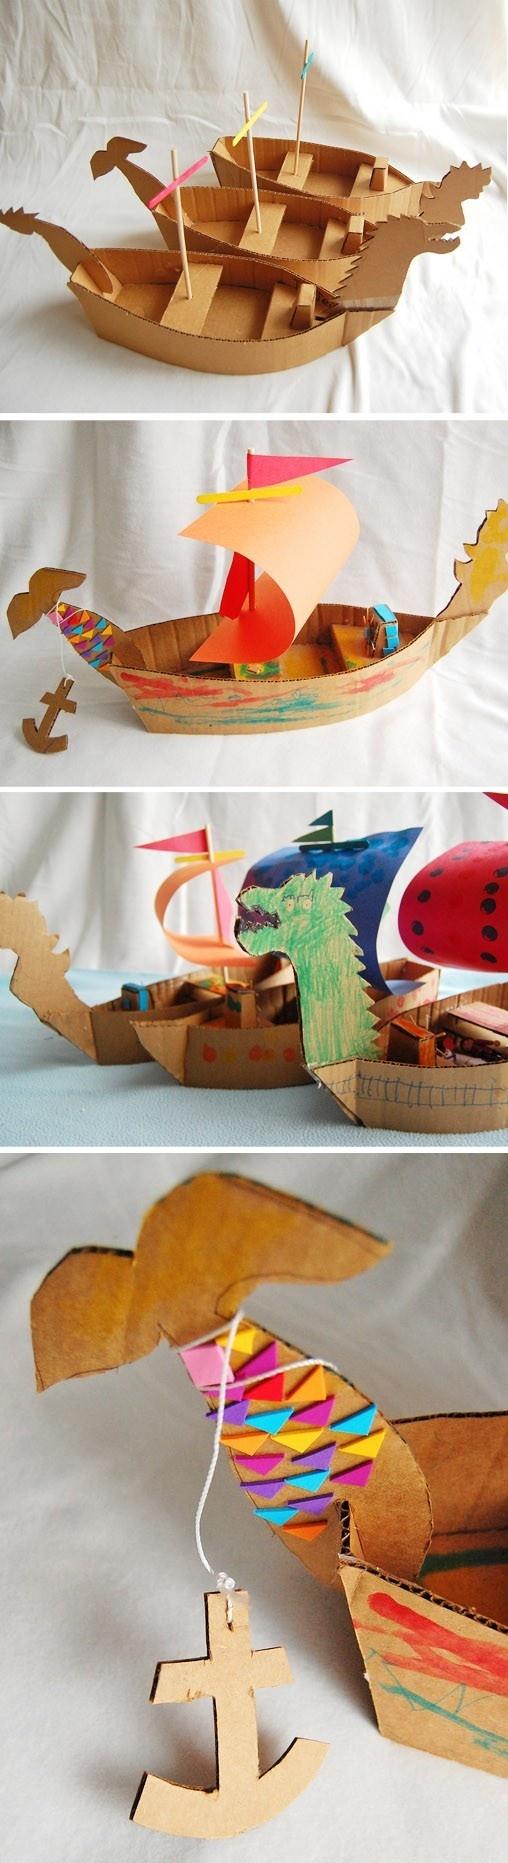 Кораблик из картона